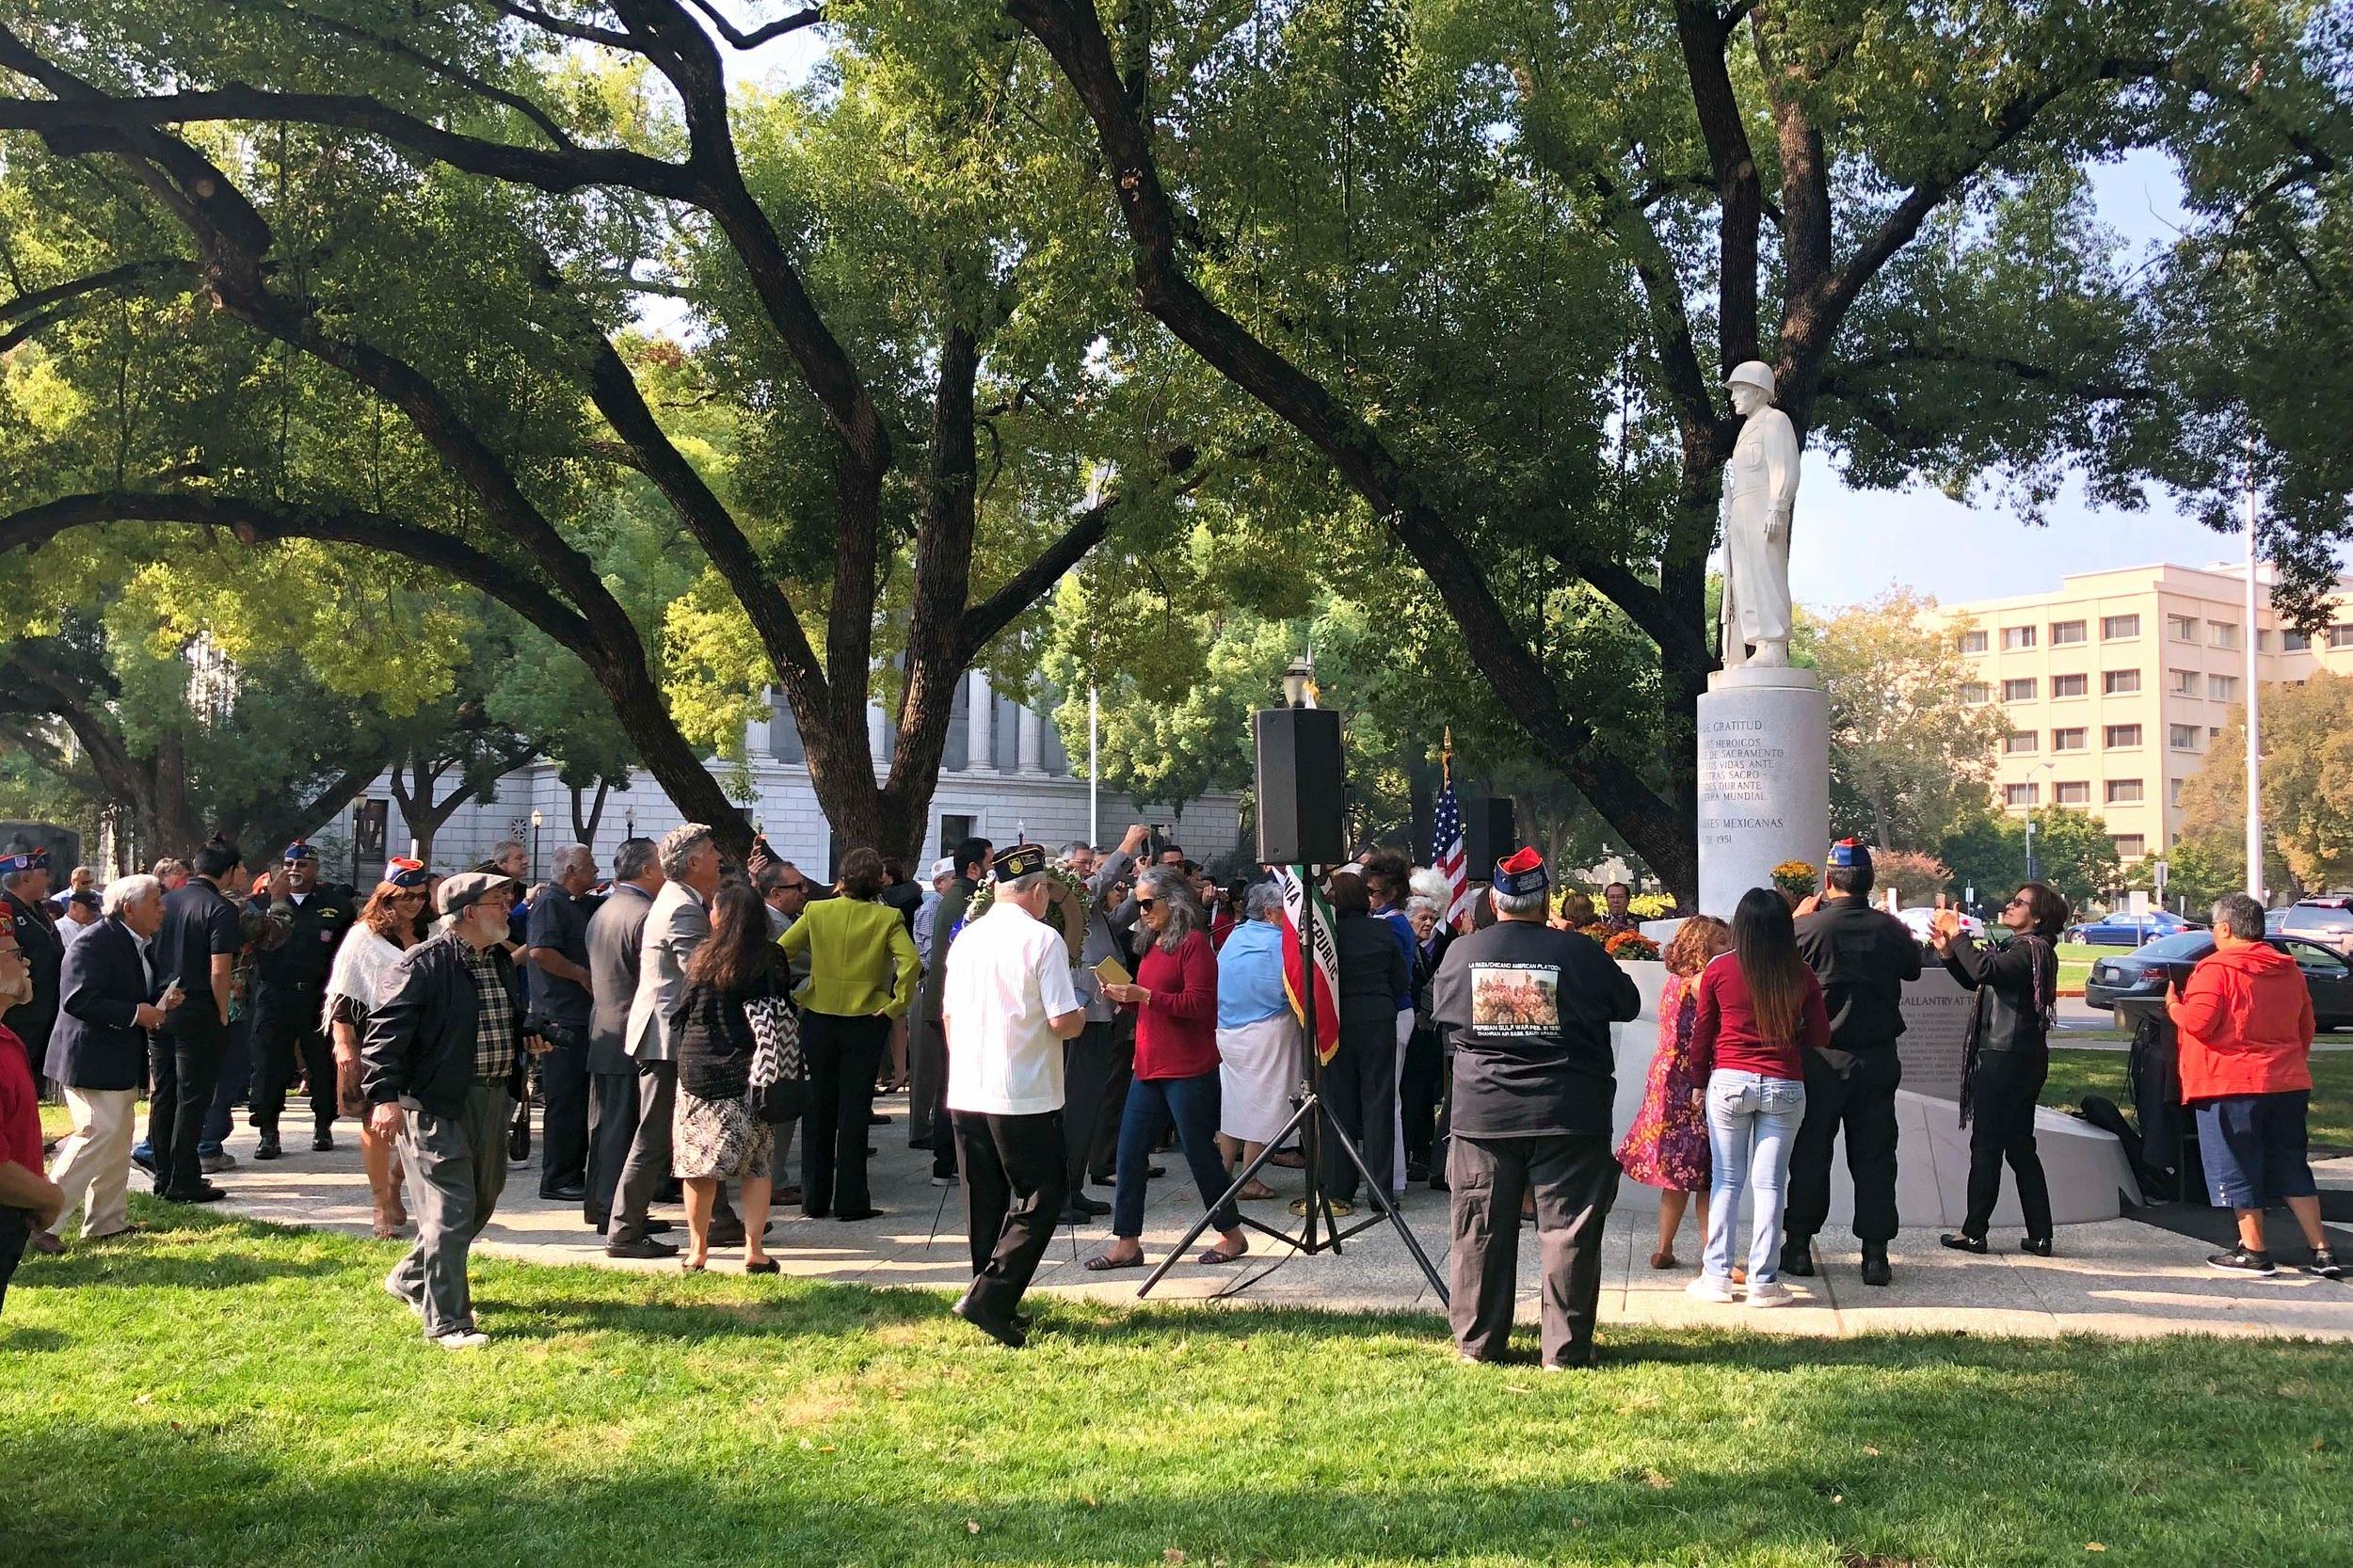 20171011 Mexican American Vets Memorial Dedication_Quad (15) web.jpg